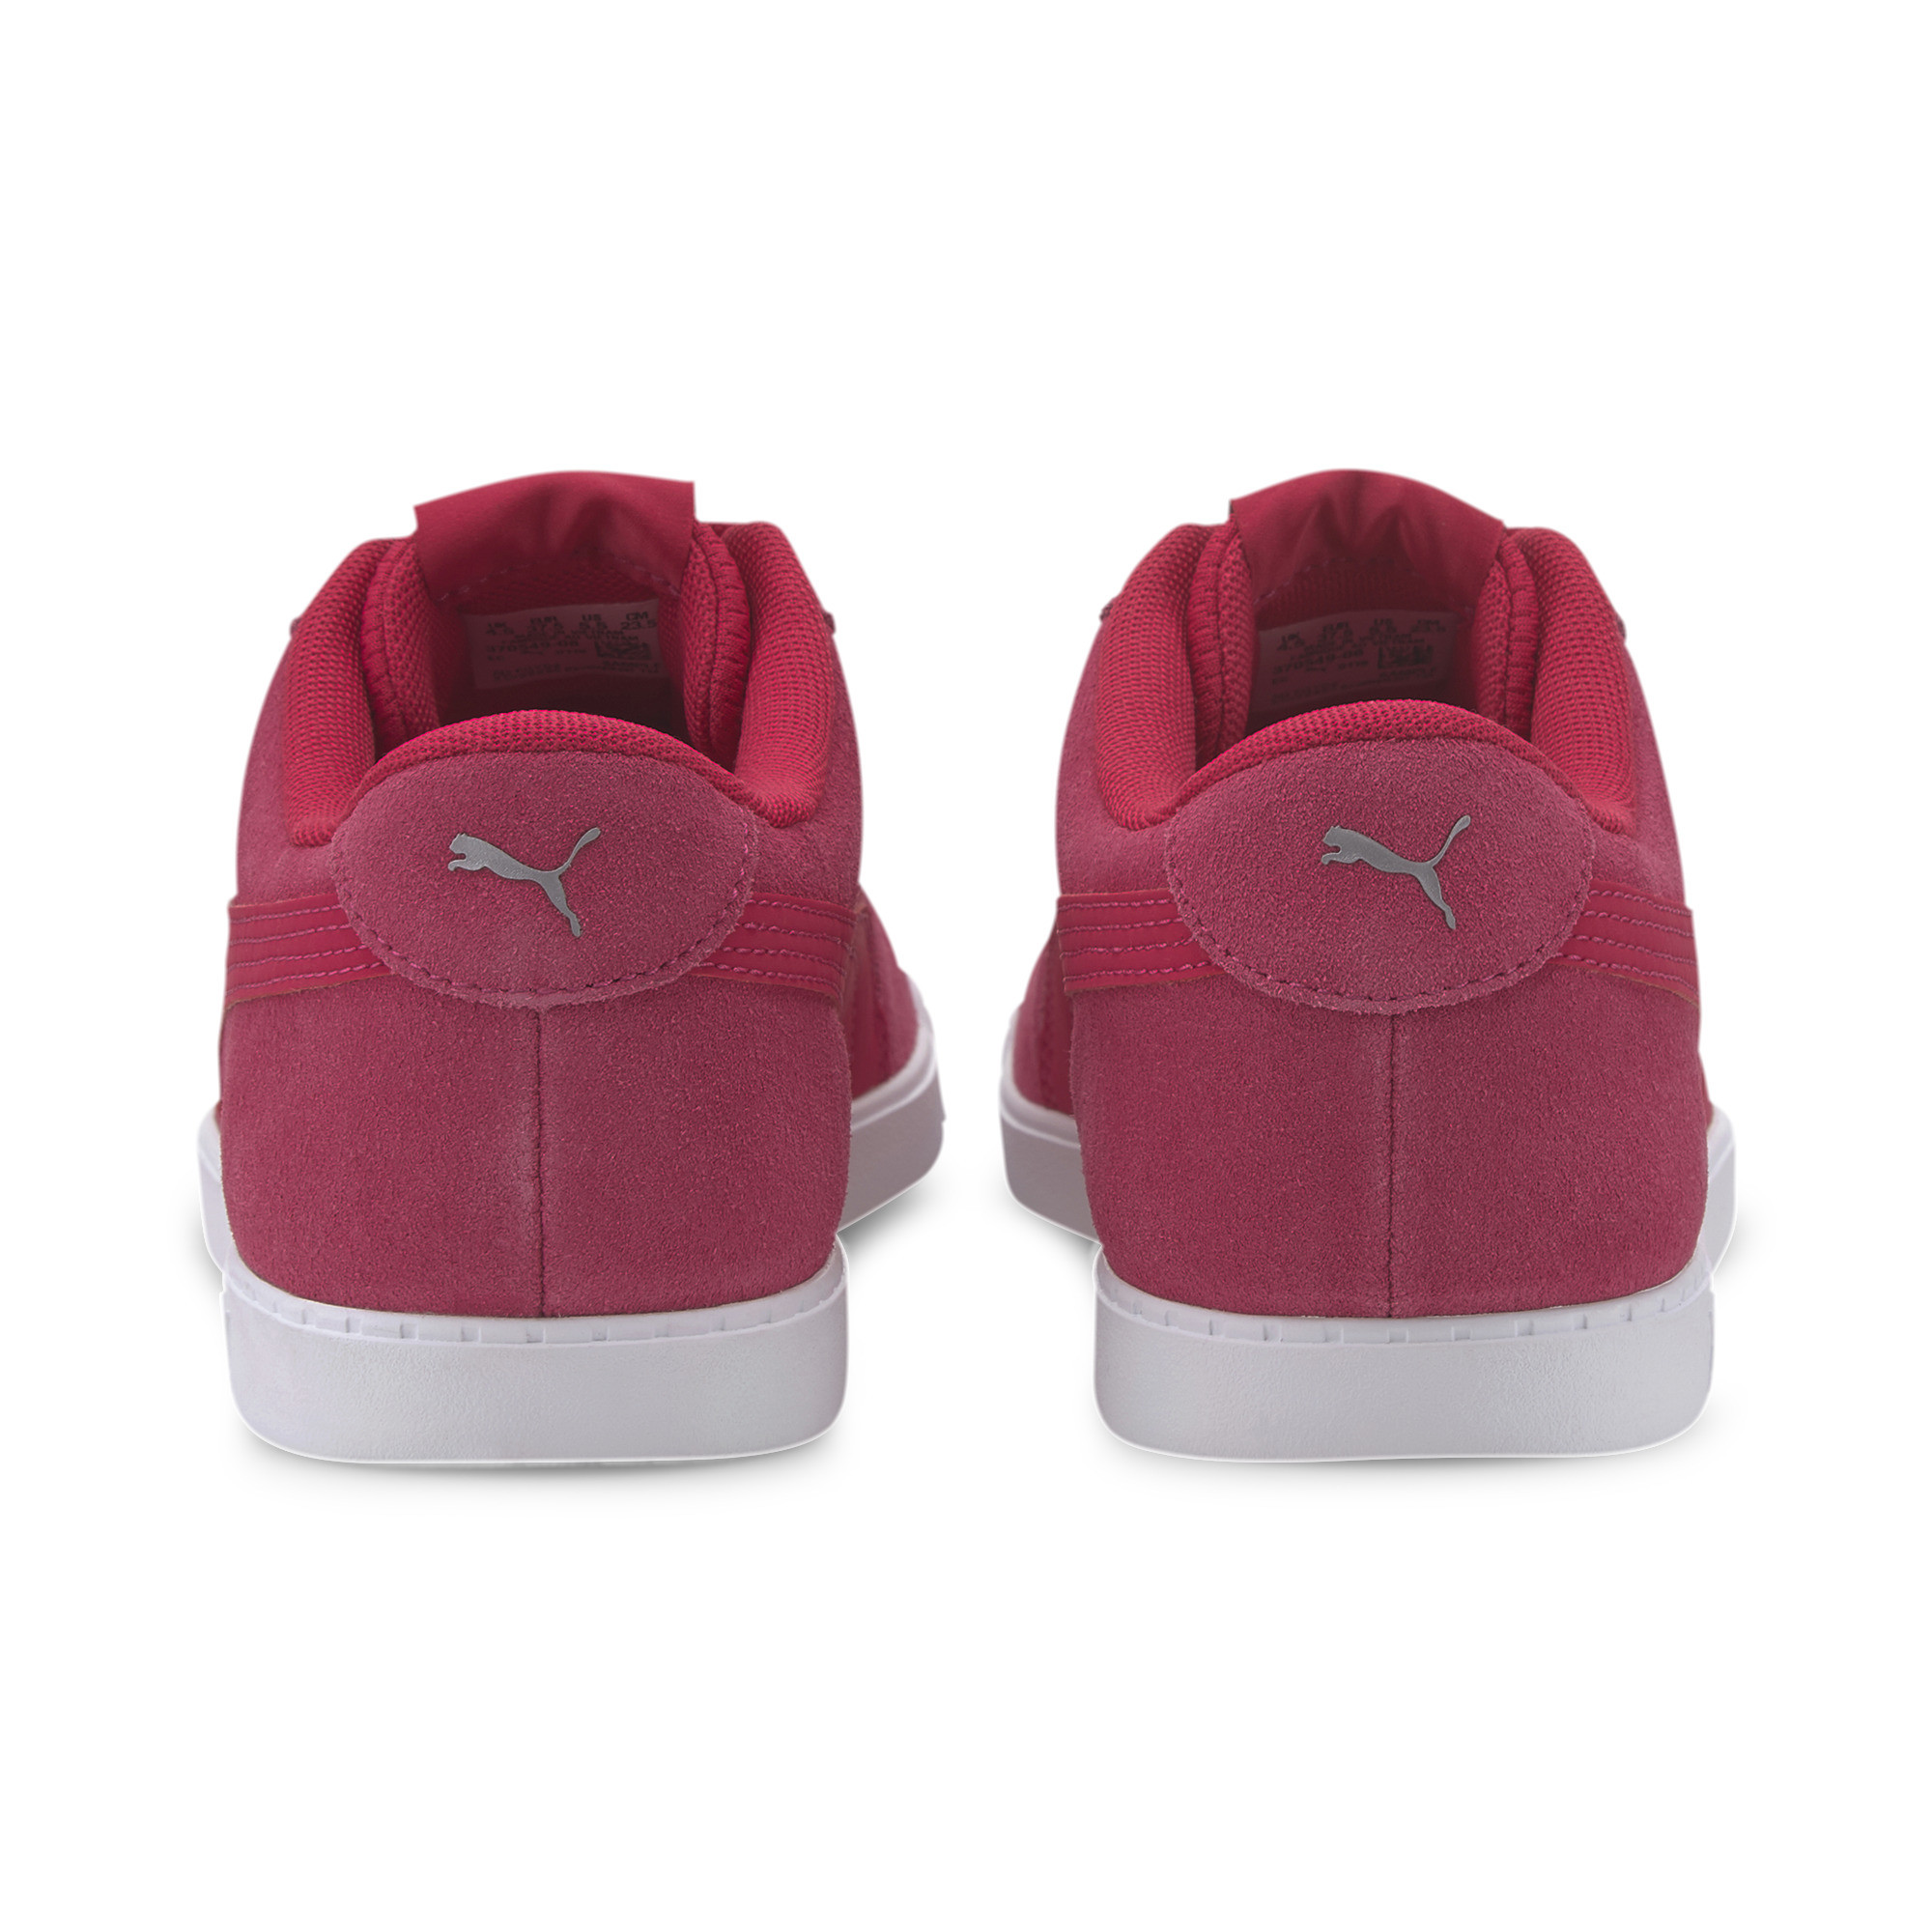 PUMA-Women-039-s-Carina-Slim-Suede-Sneakers thumbnail 10